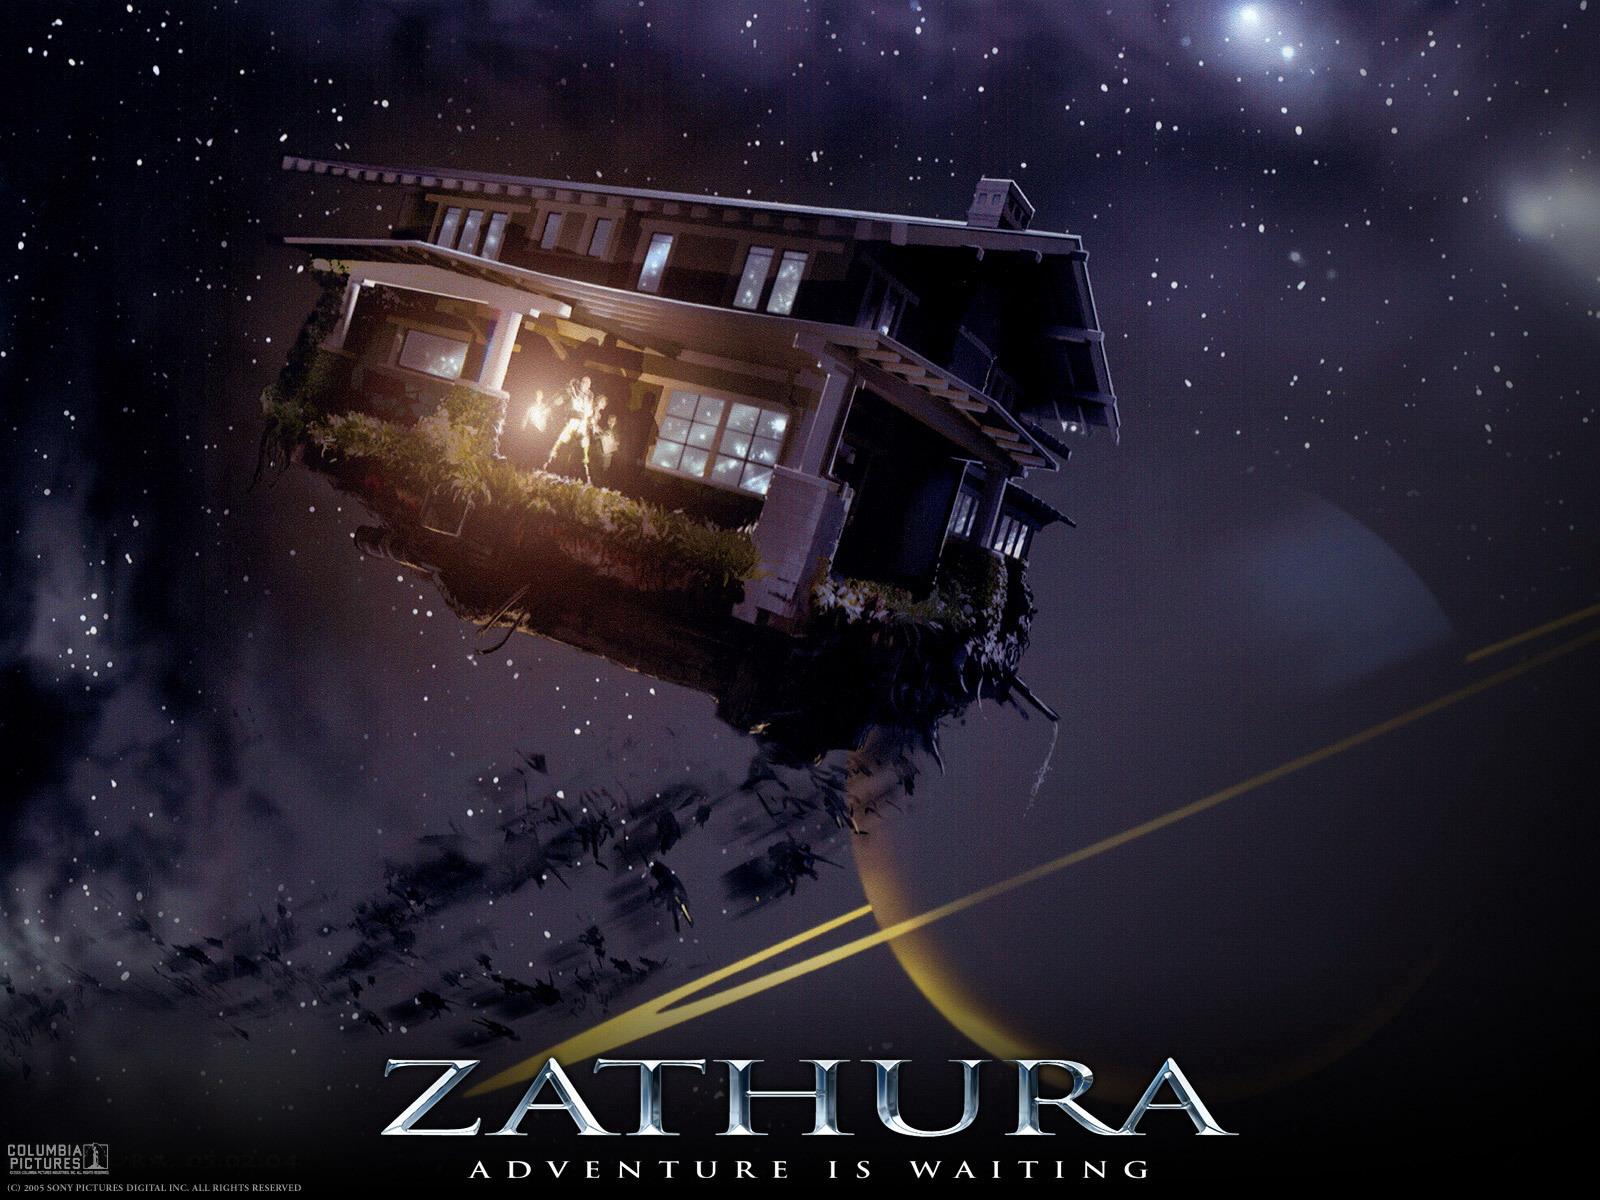 zathura movie hd free download